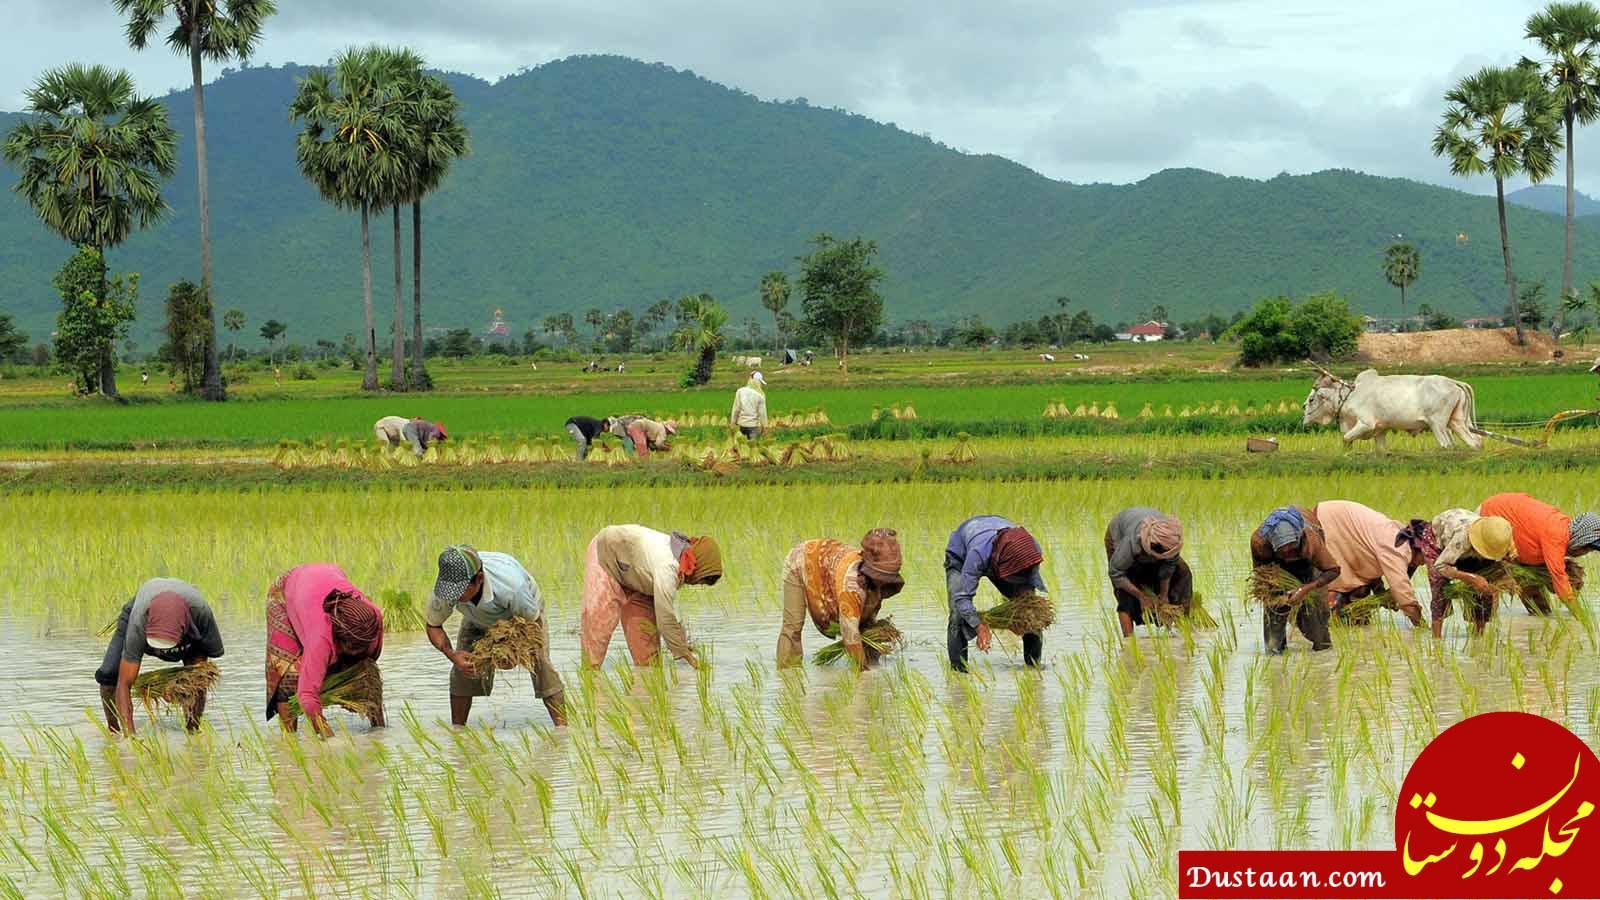 www.dustaan.com فقط 2 استان شمالی کشور مجاز به کشت برنج هستند